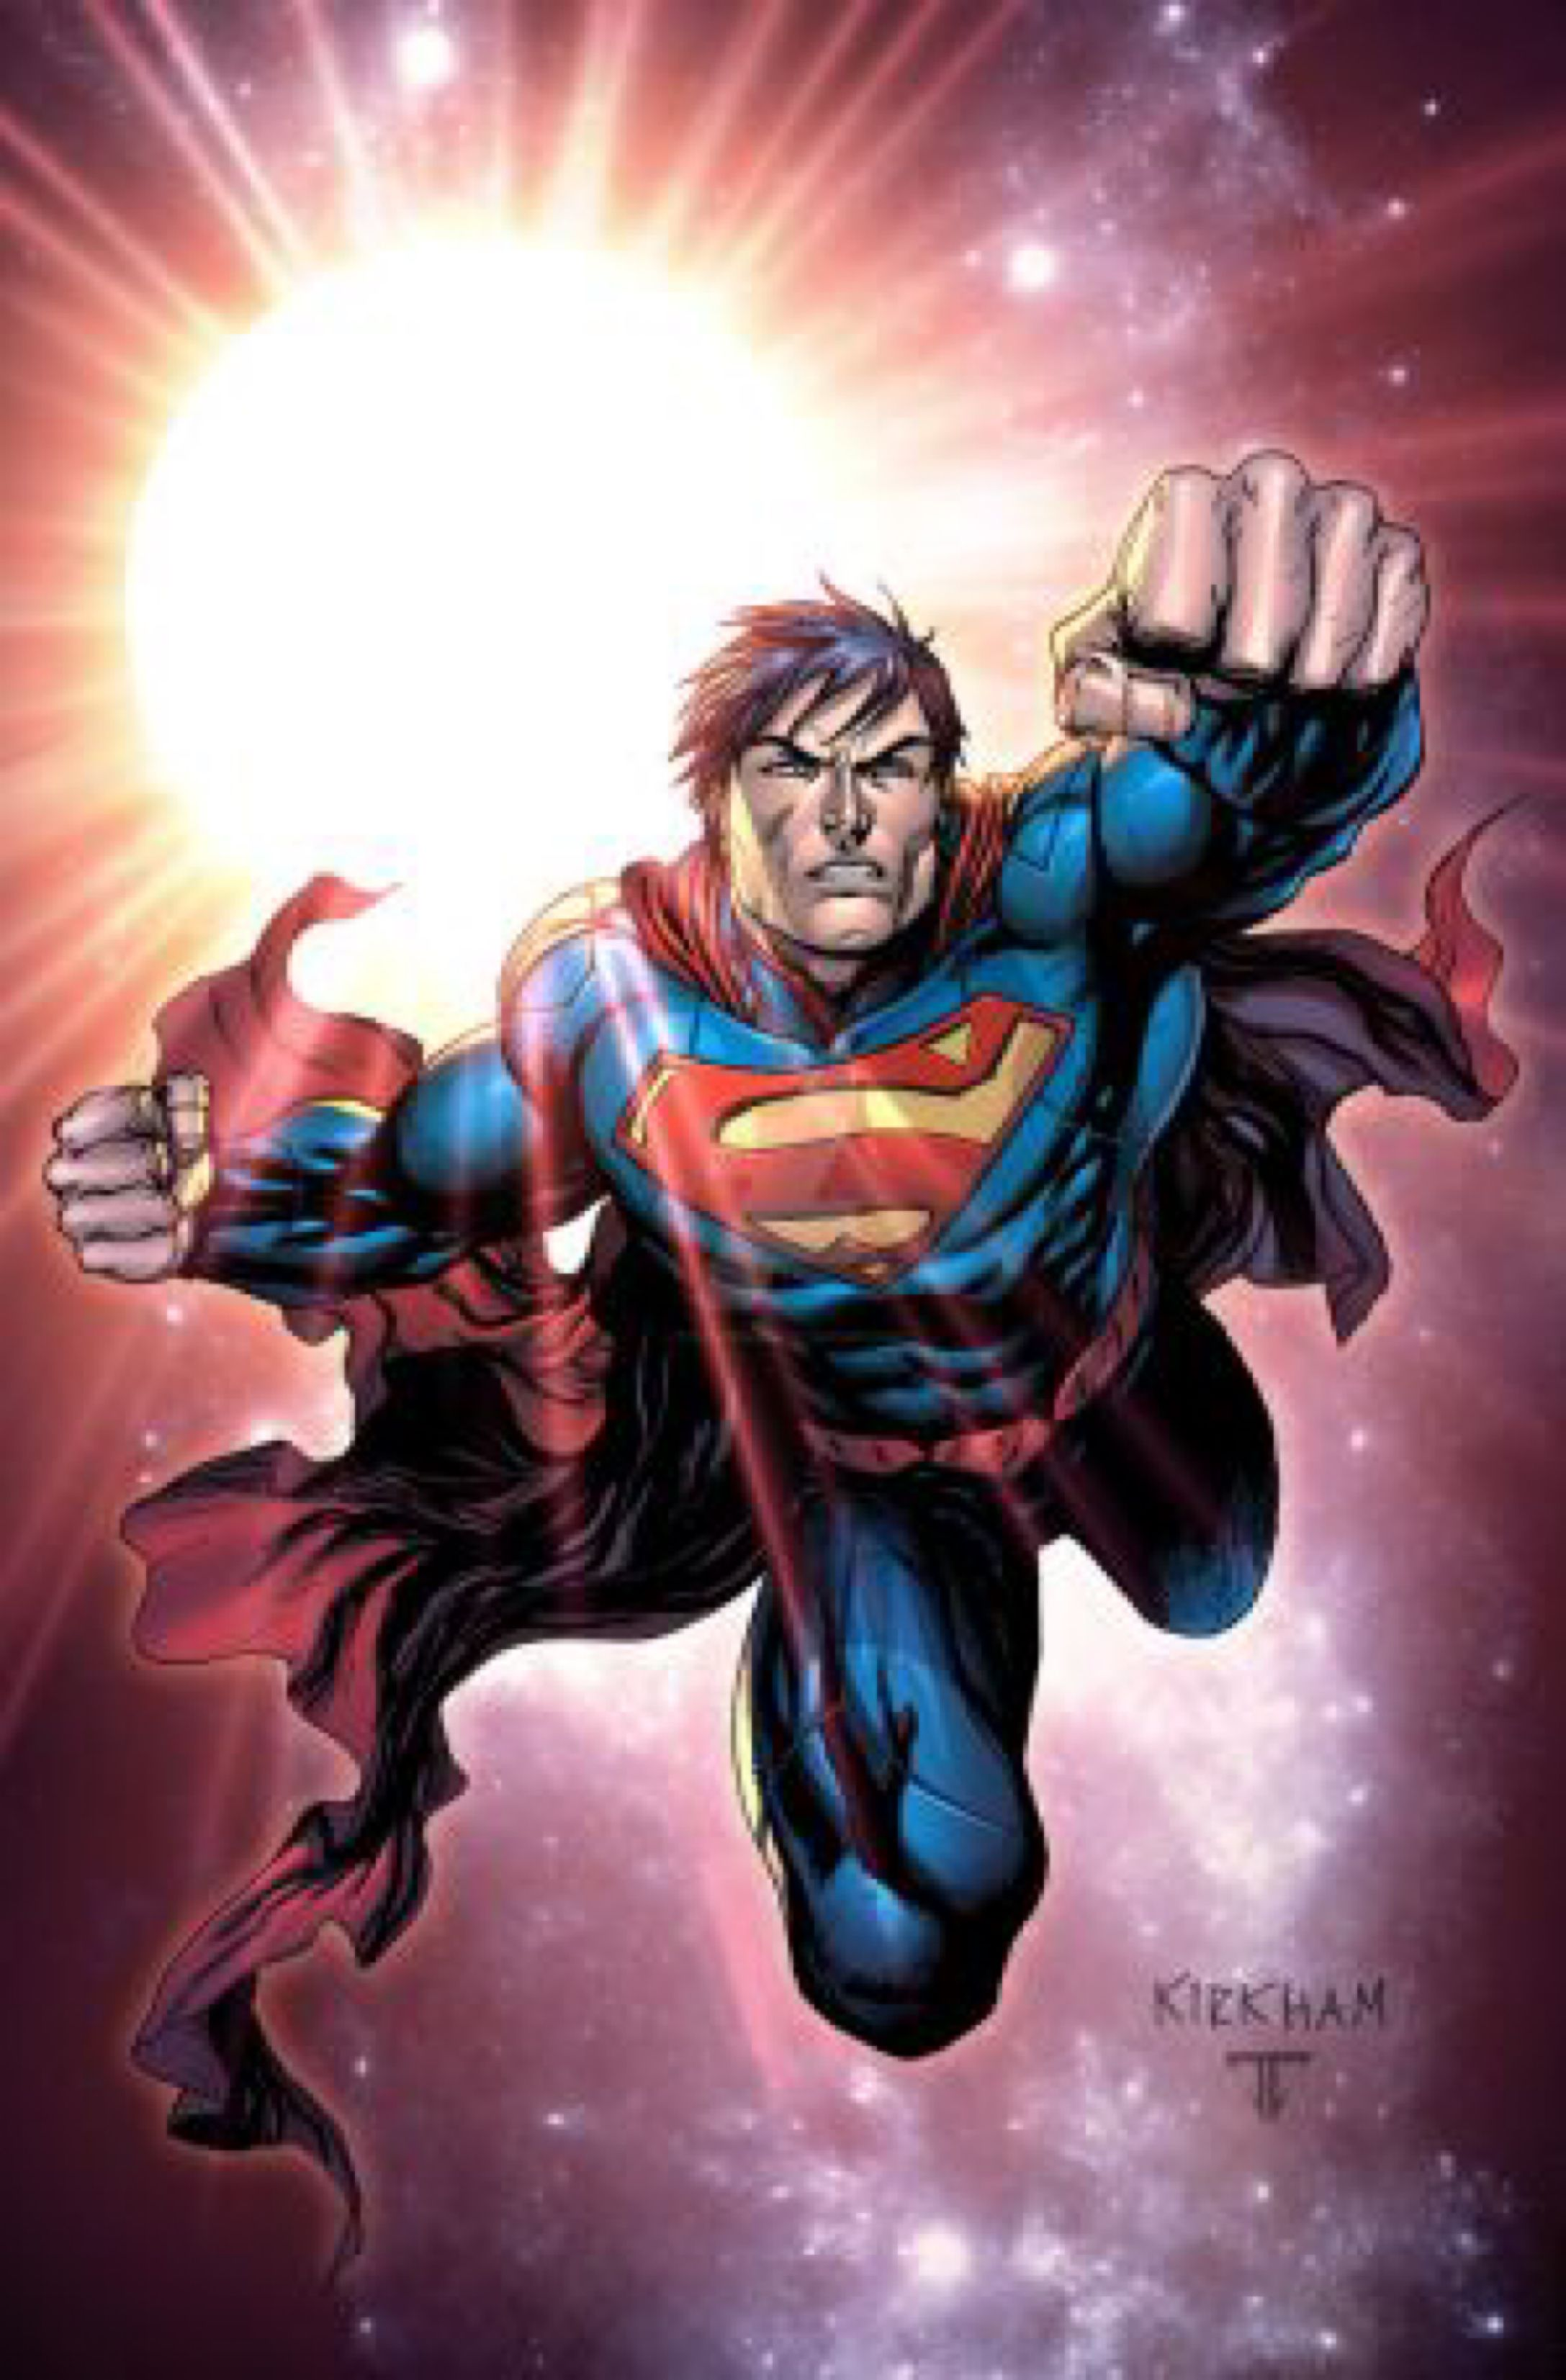 Superman Commission By Tylerkirkham On Deviantart Dc Comics Artwork Superman Art Superhero Art